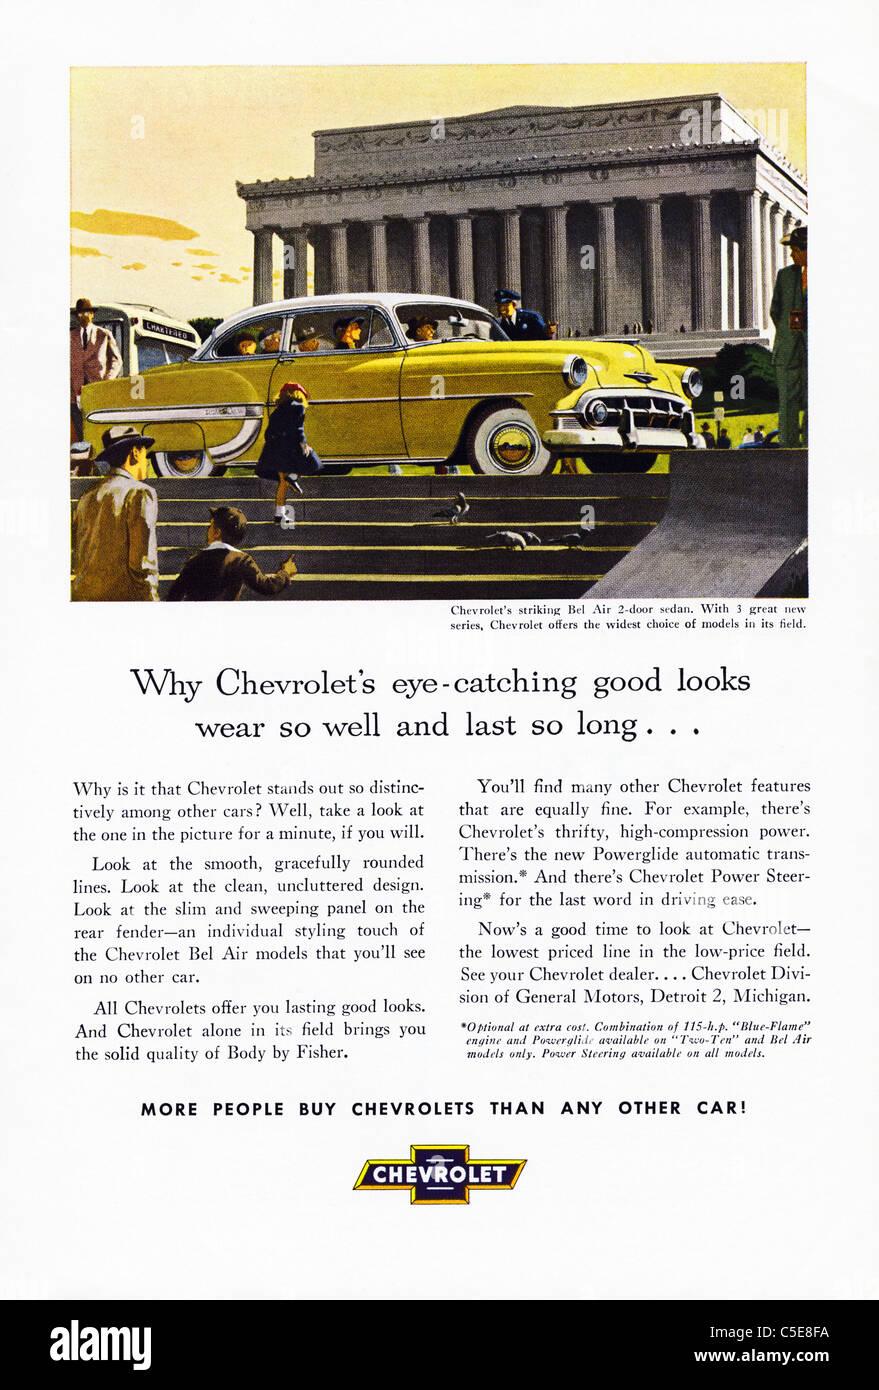 Original 1950s advert in American magazine advertising CHEVROLET cars - Stock Image